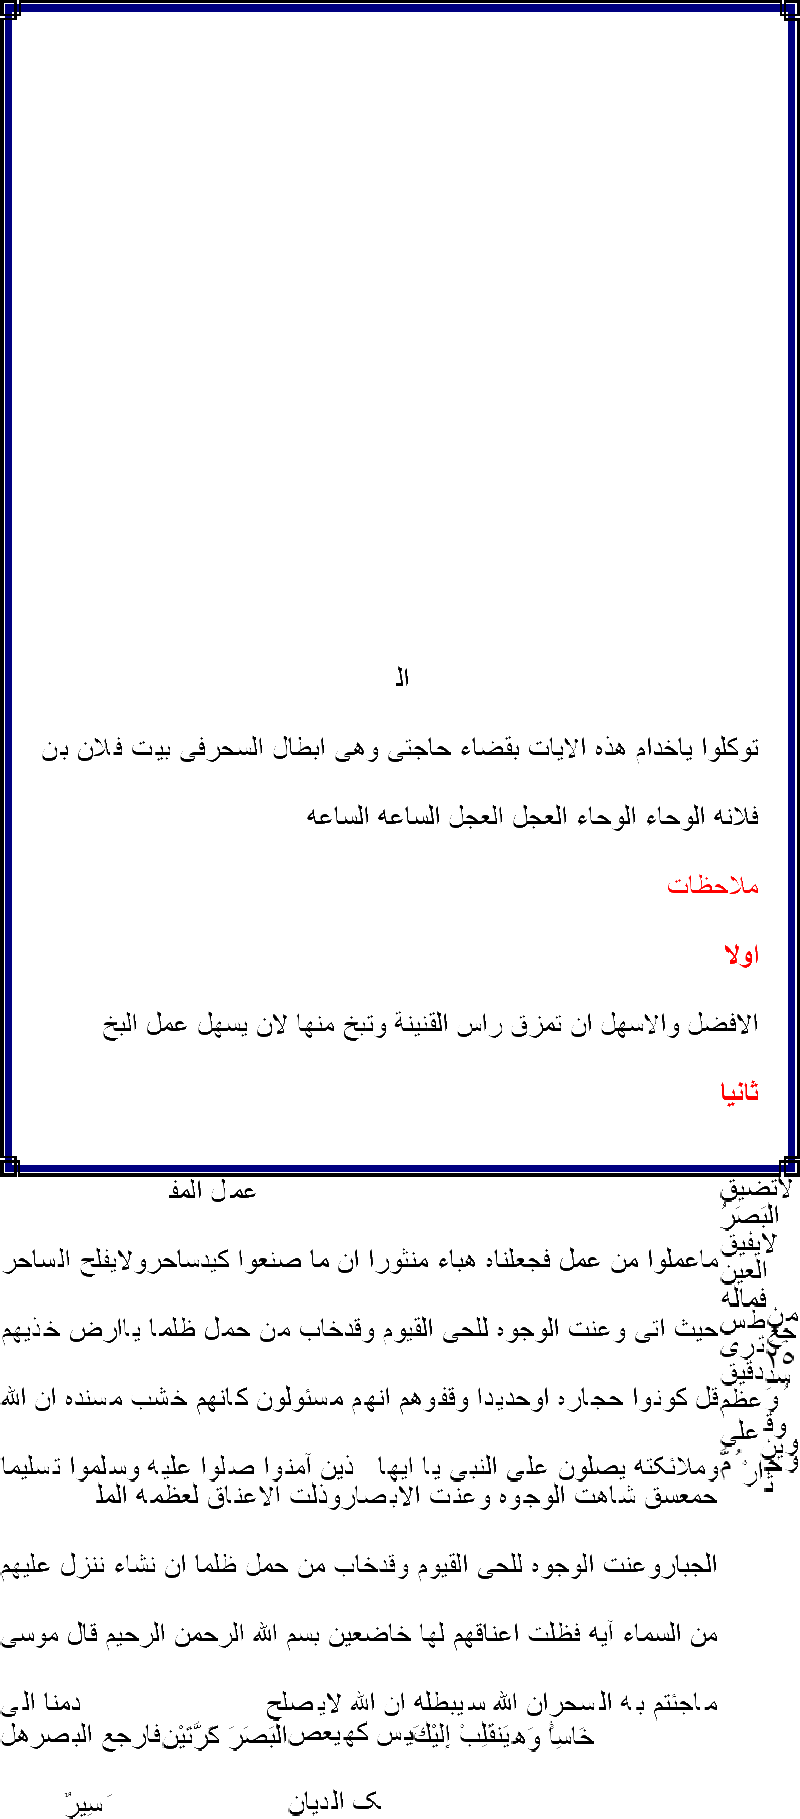 ﺑﺴﻢ اﷲ اﻟﺮﺣﻤﻦ اﻟﺮﺣﻴﻢ Sheet Music Chart Reading